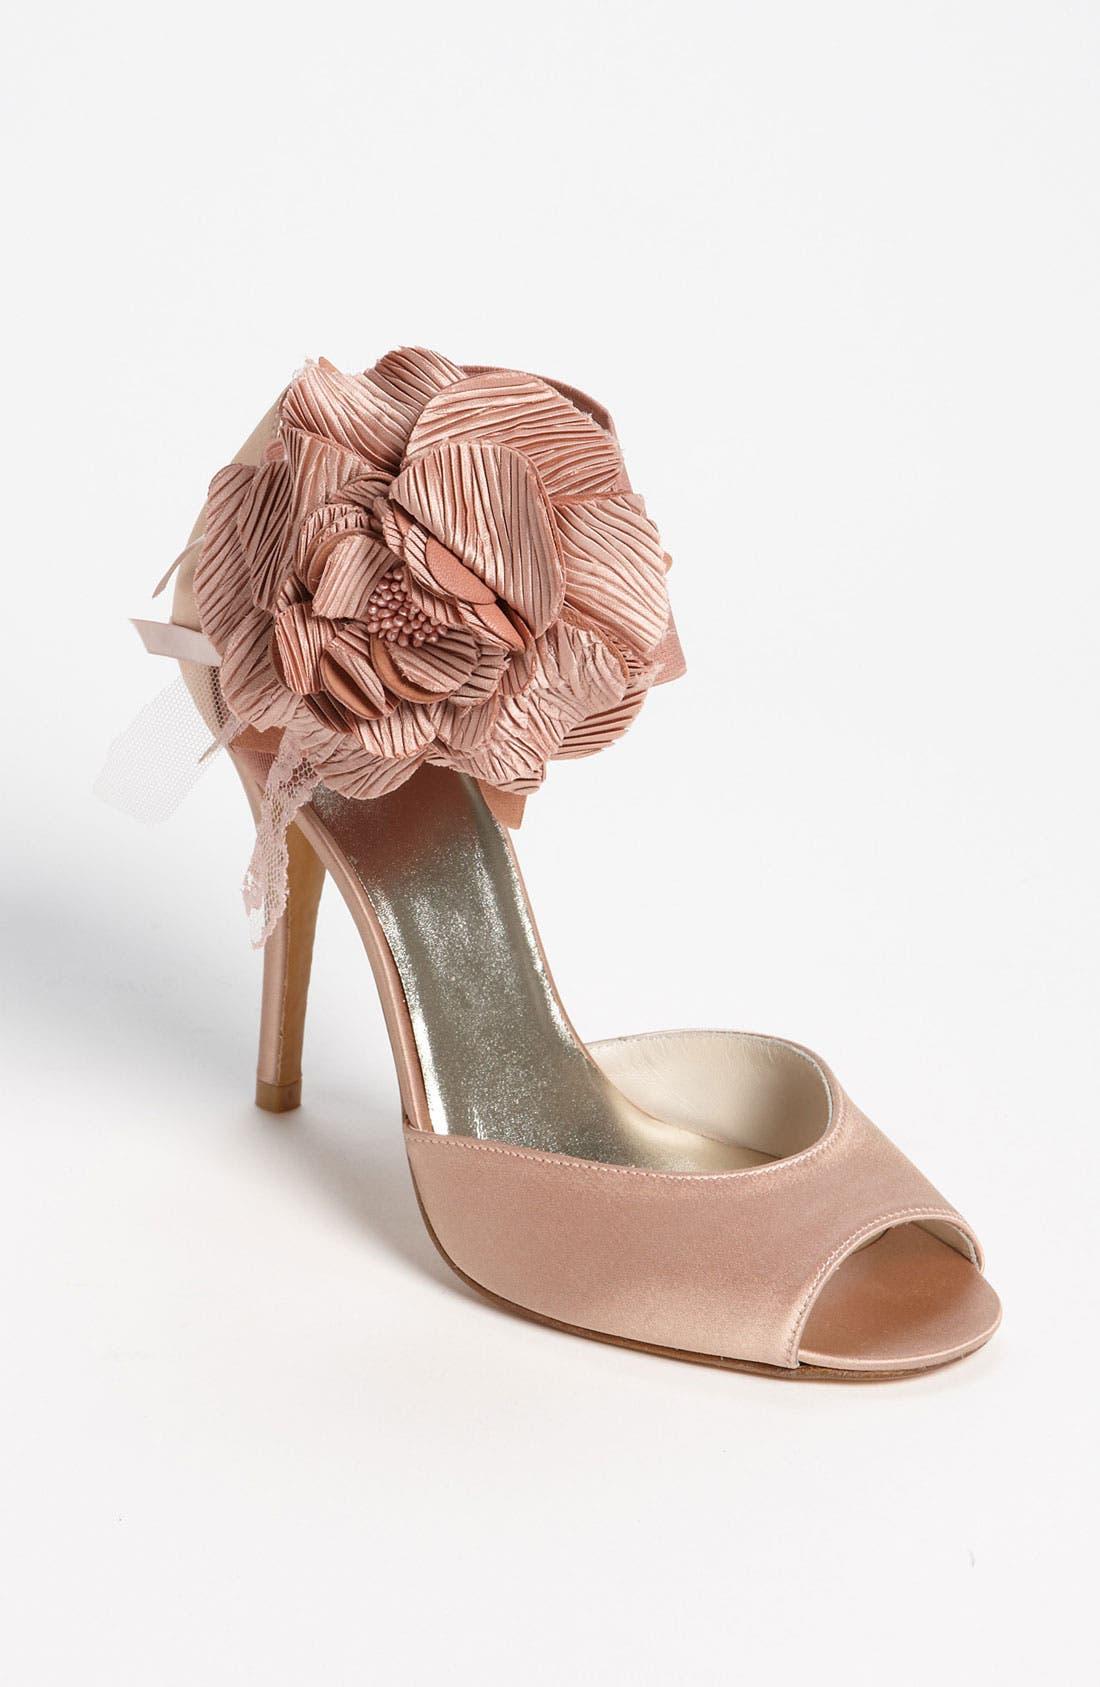 Main Image - Stuart Weitzman 'Bodabing' Sandal